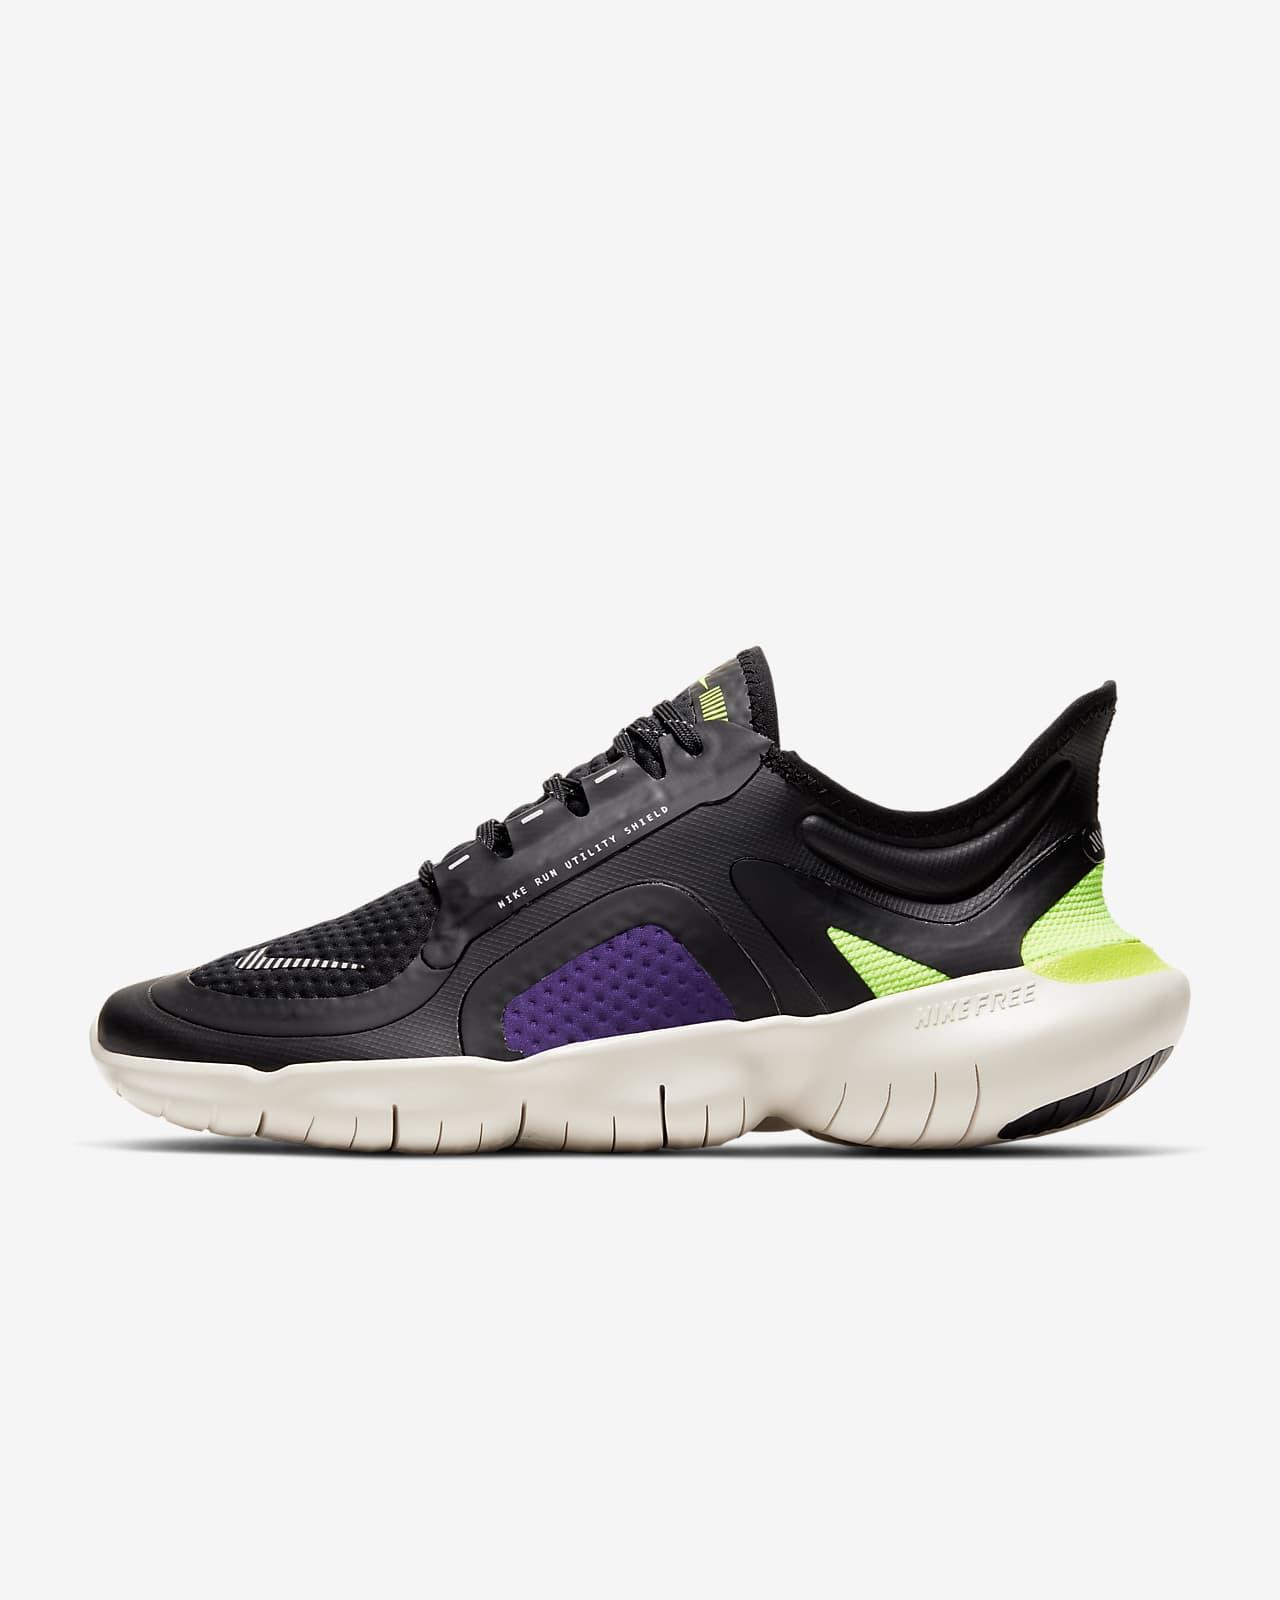 Nike Free RN 5.0 Shield Women's Running